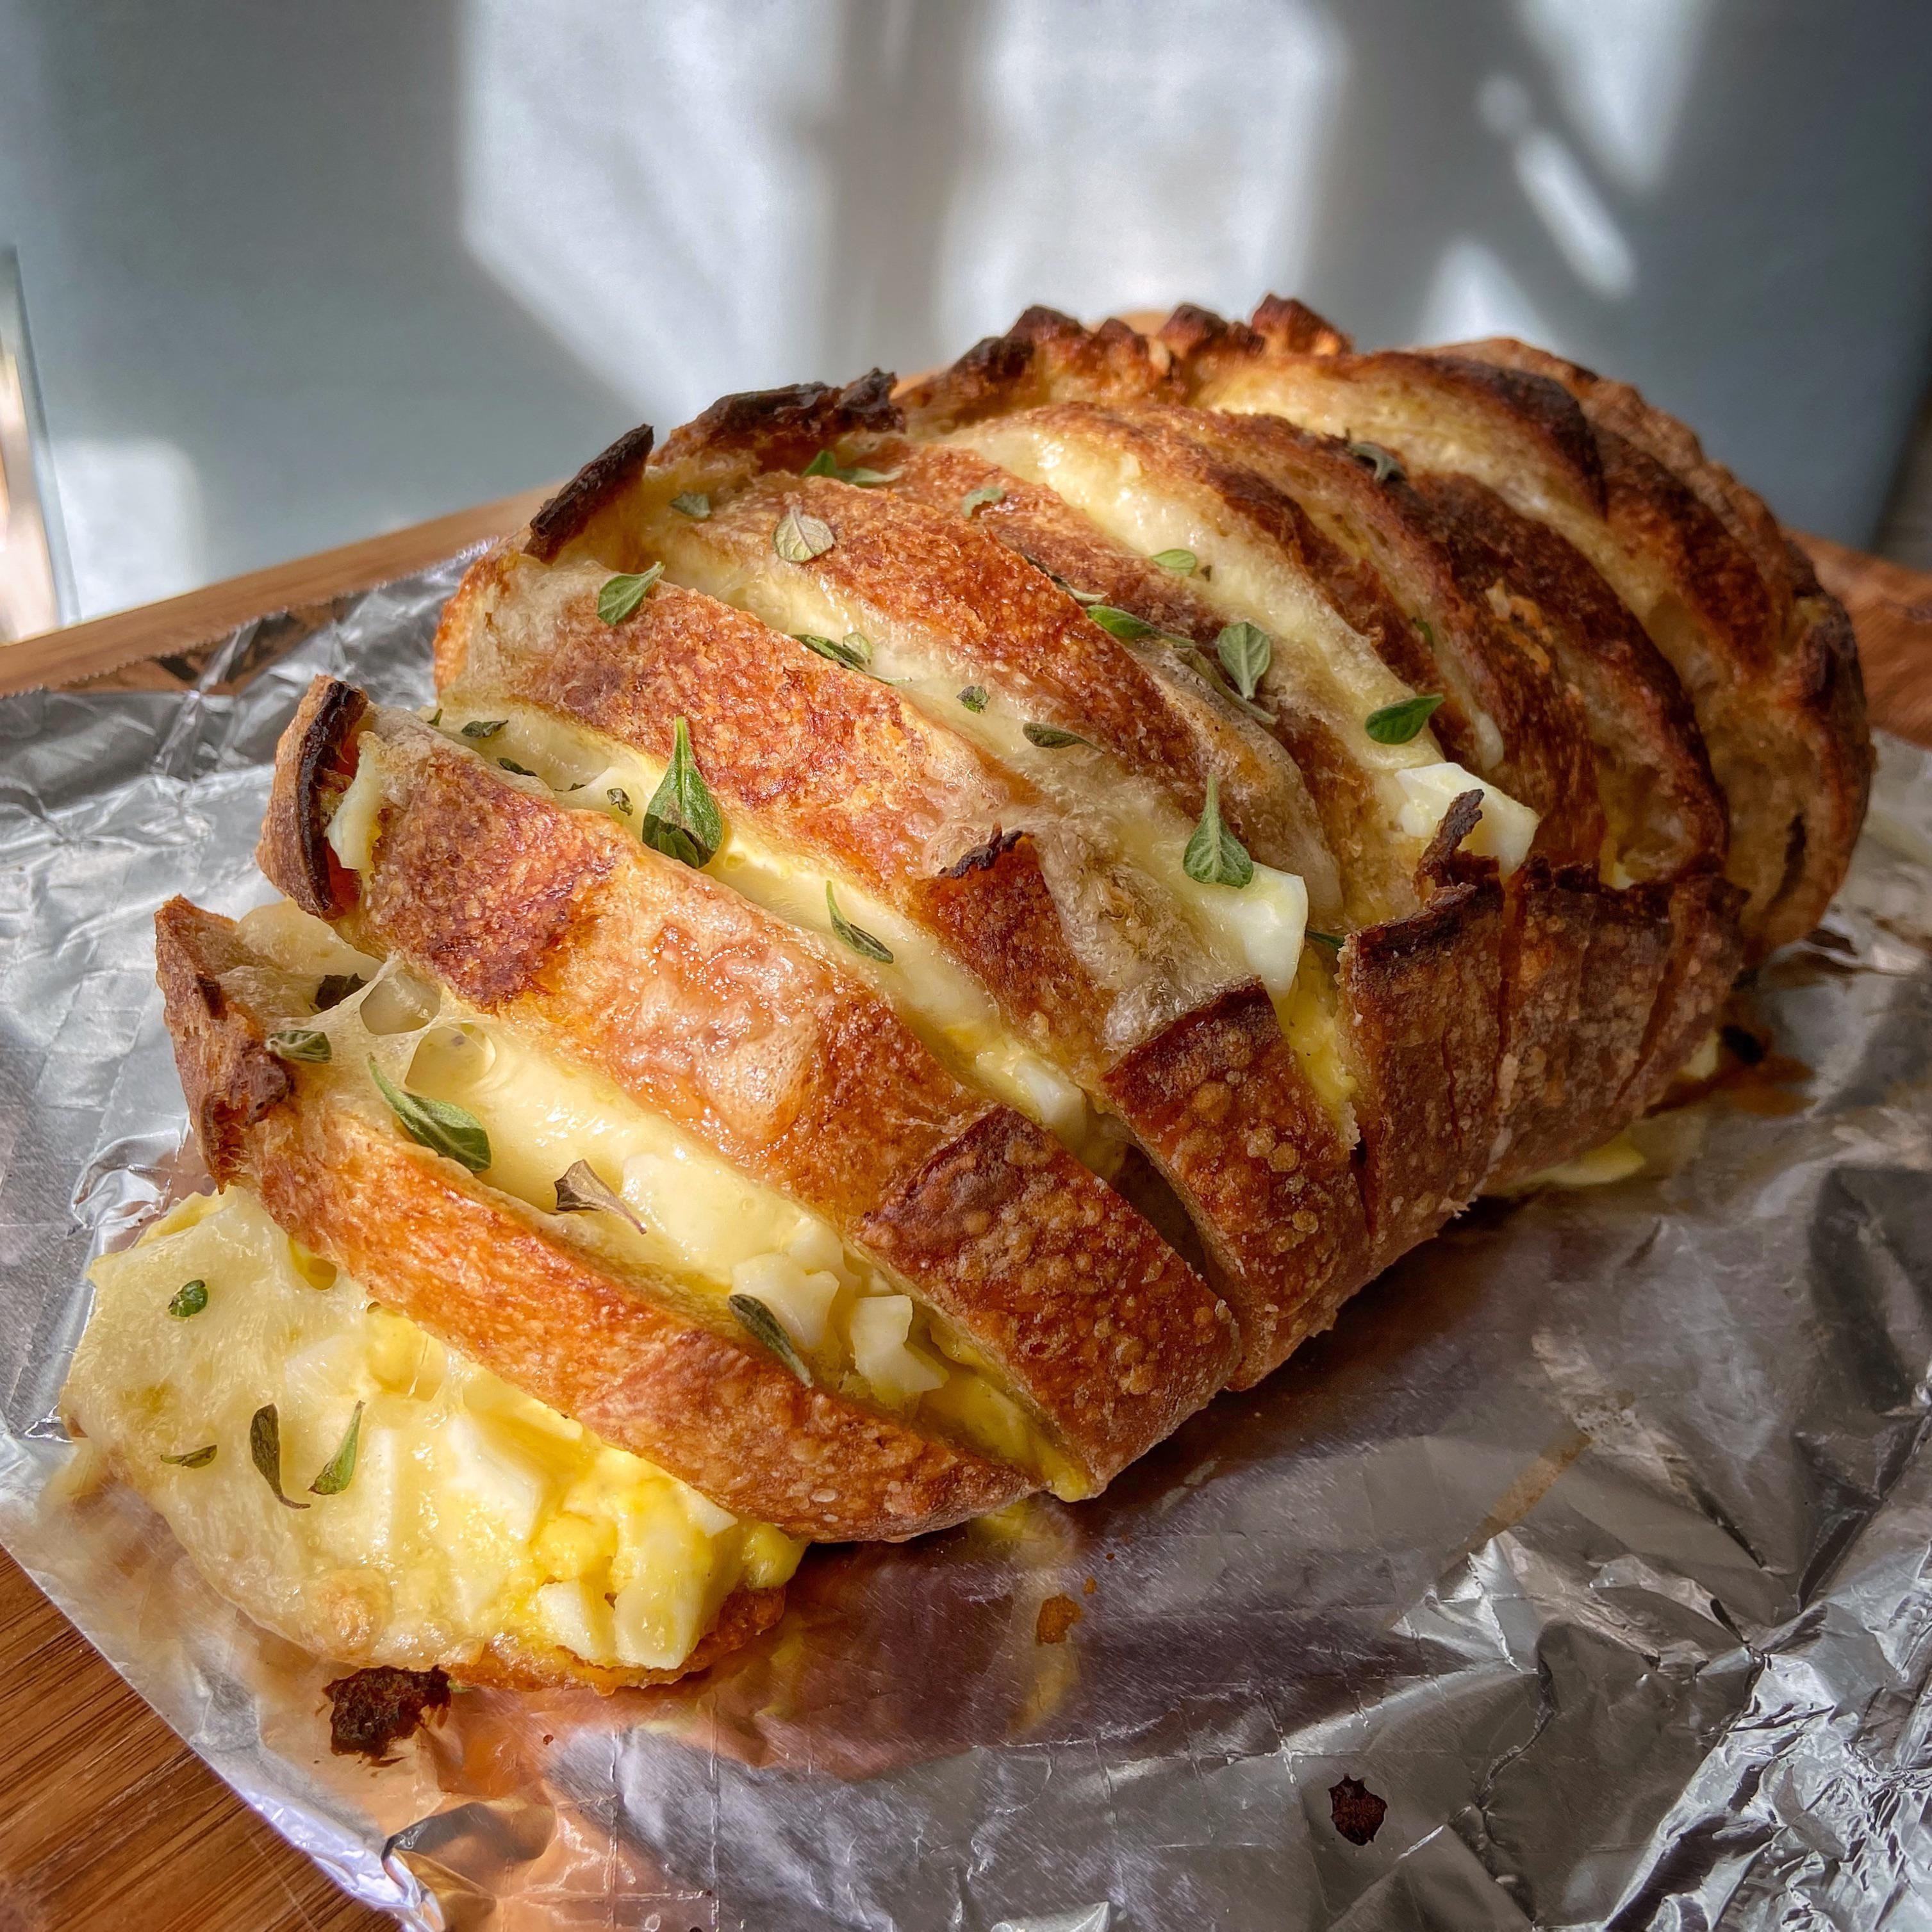 Korean Garlic Cream Cheese Bread Meets Japanese Tamago Sando In 2020 Cream Cheese Bread Food Cheese Bread